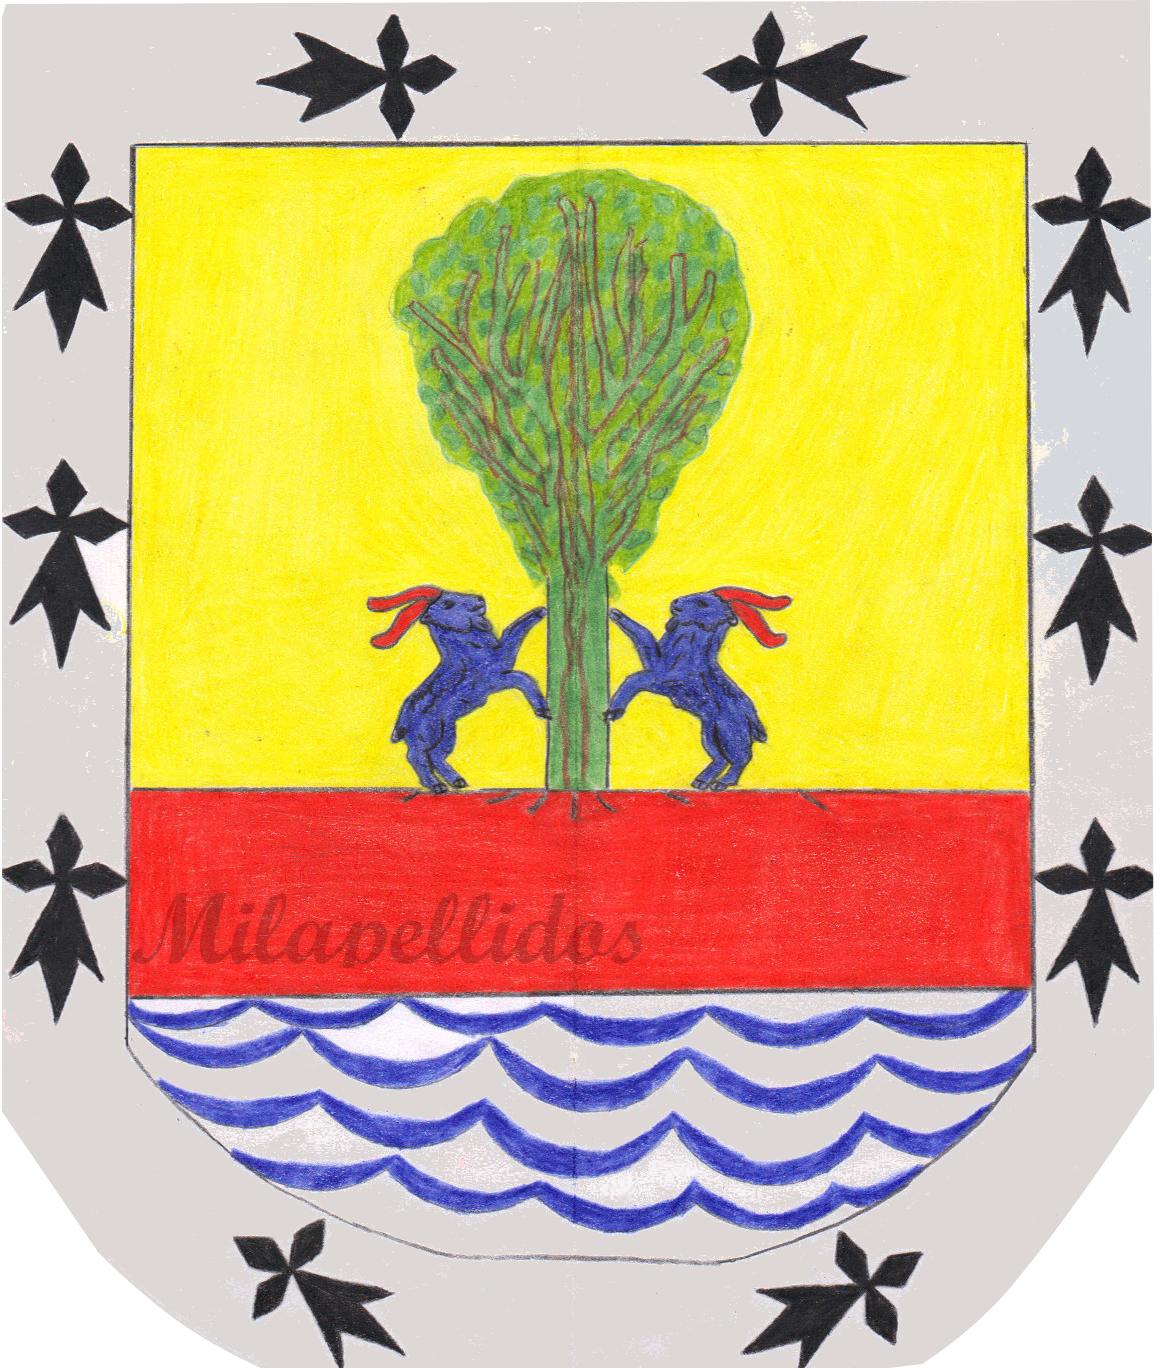 Escudo Urrecha